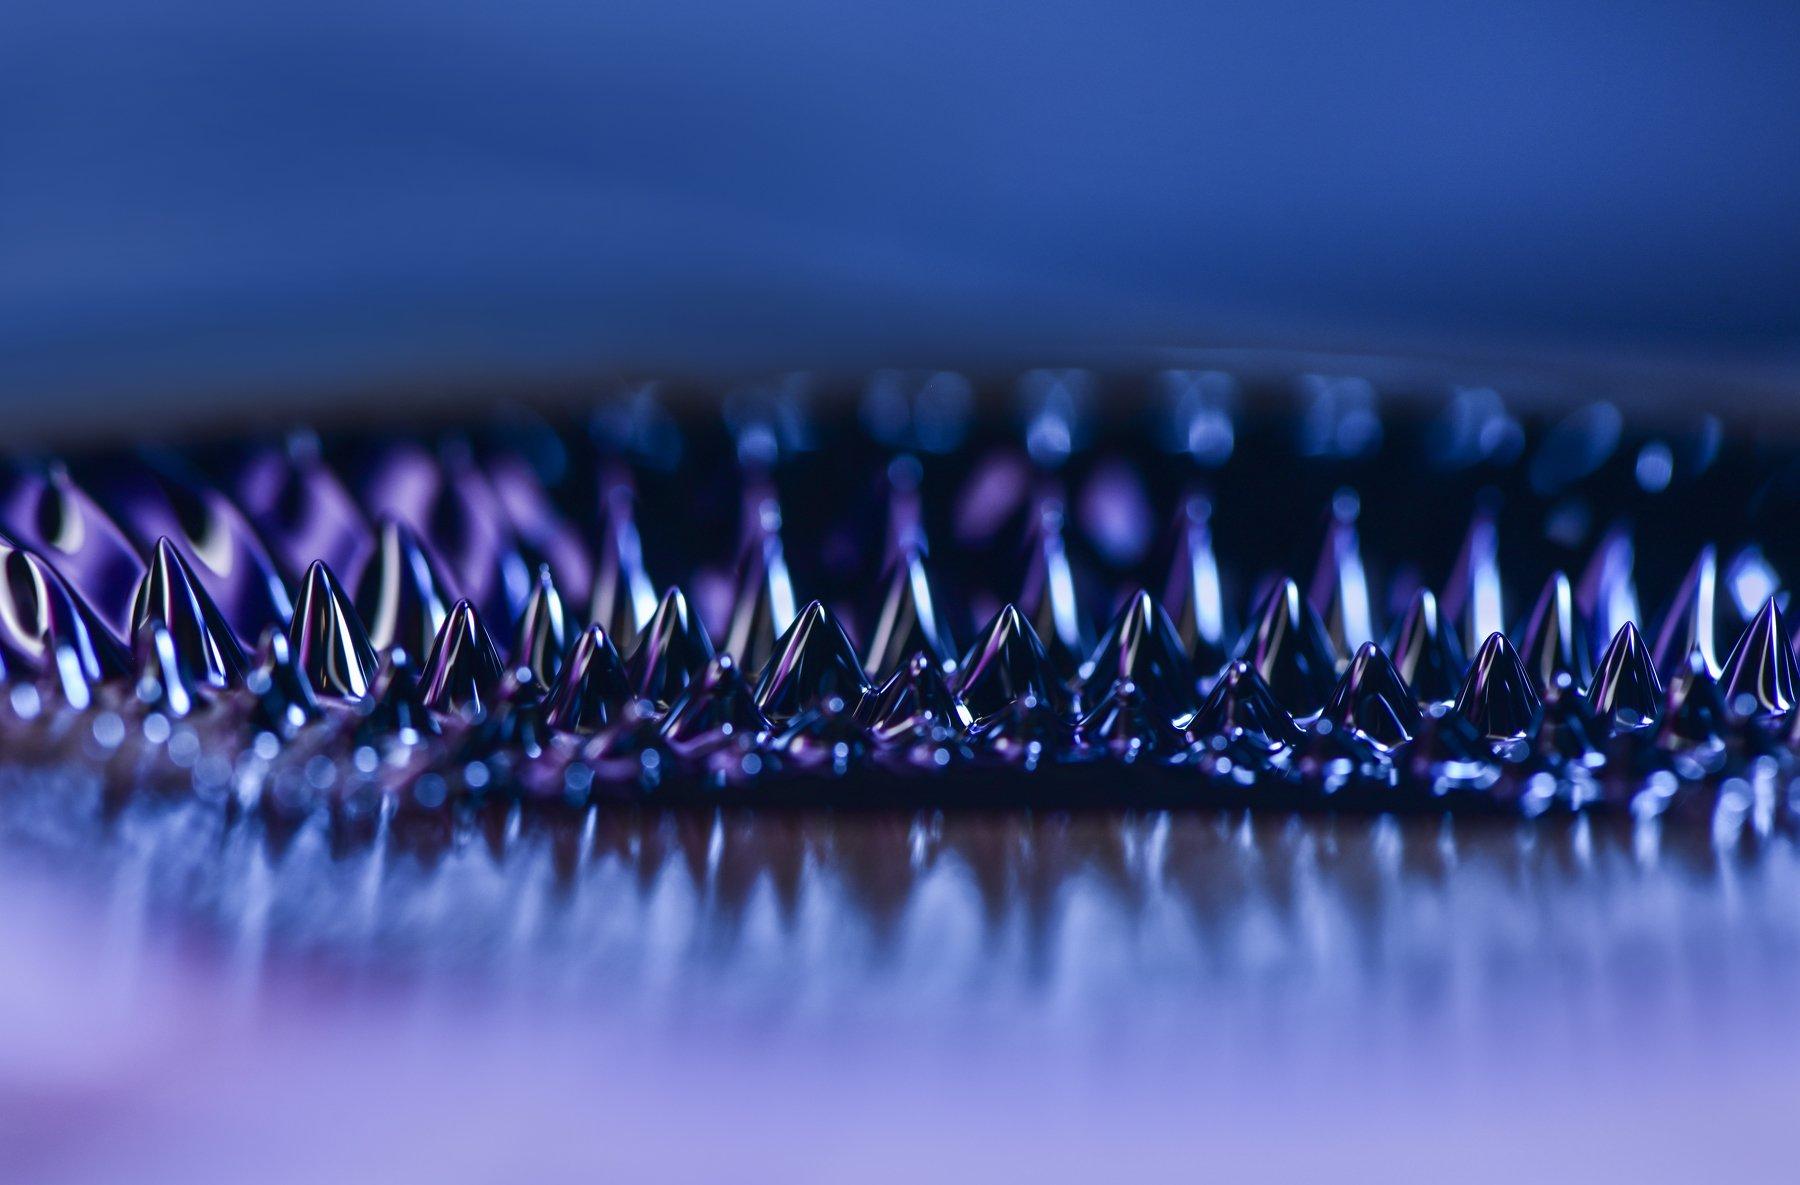 abstract, abstraction, blue, purple, close-up, Ивелина Благоева